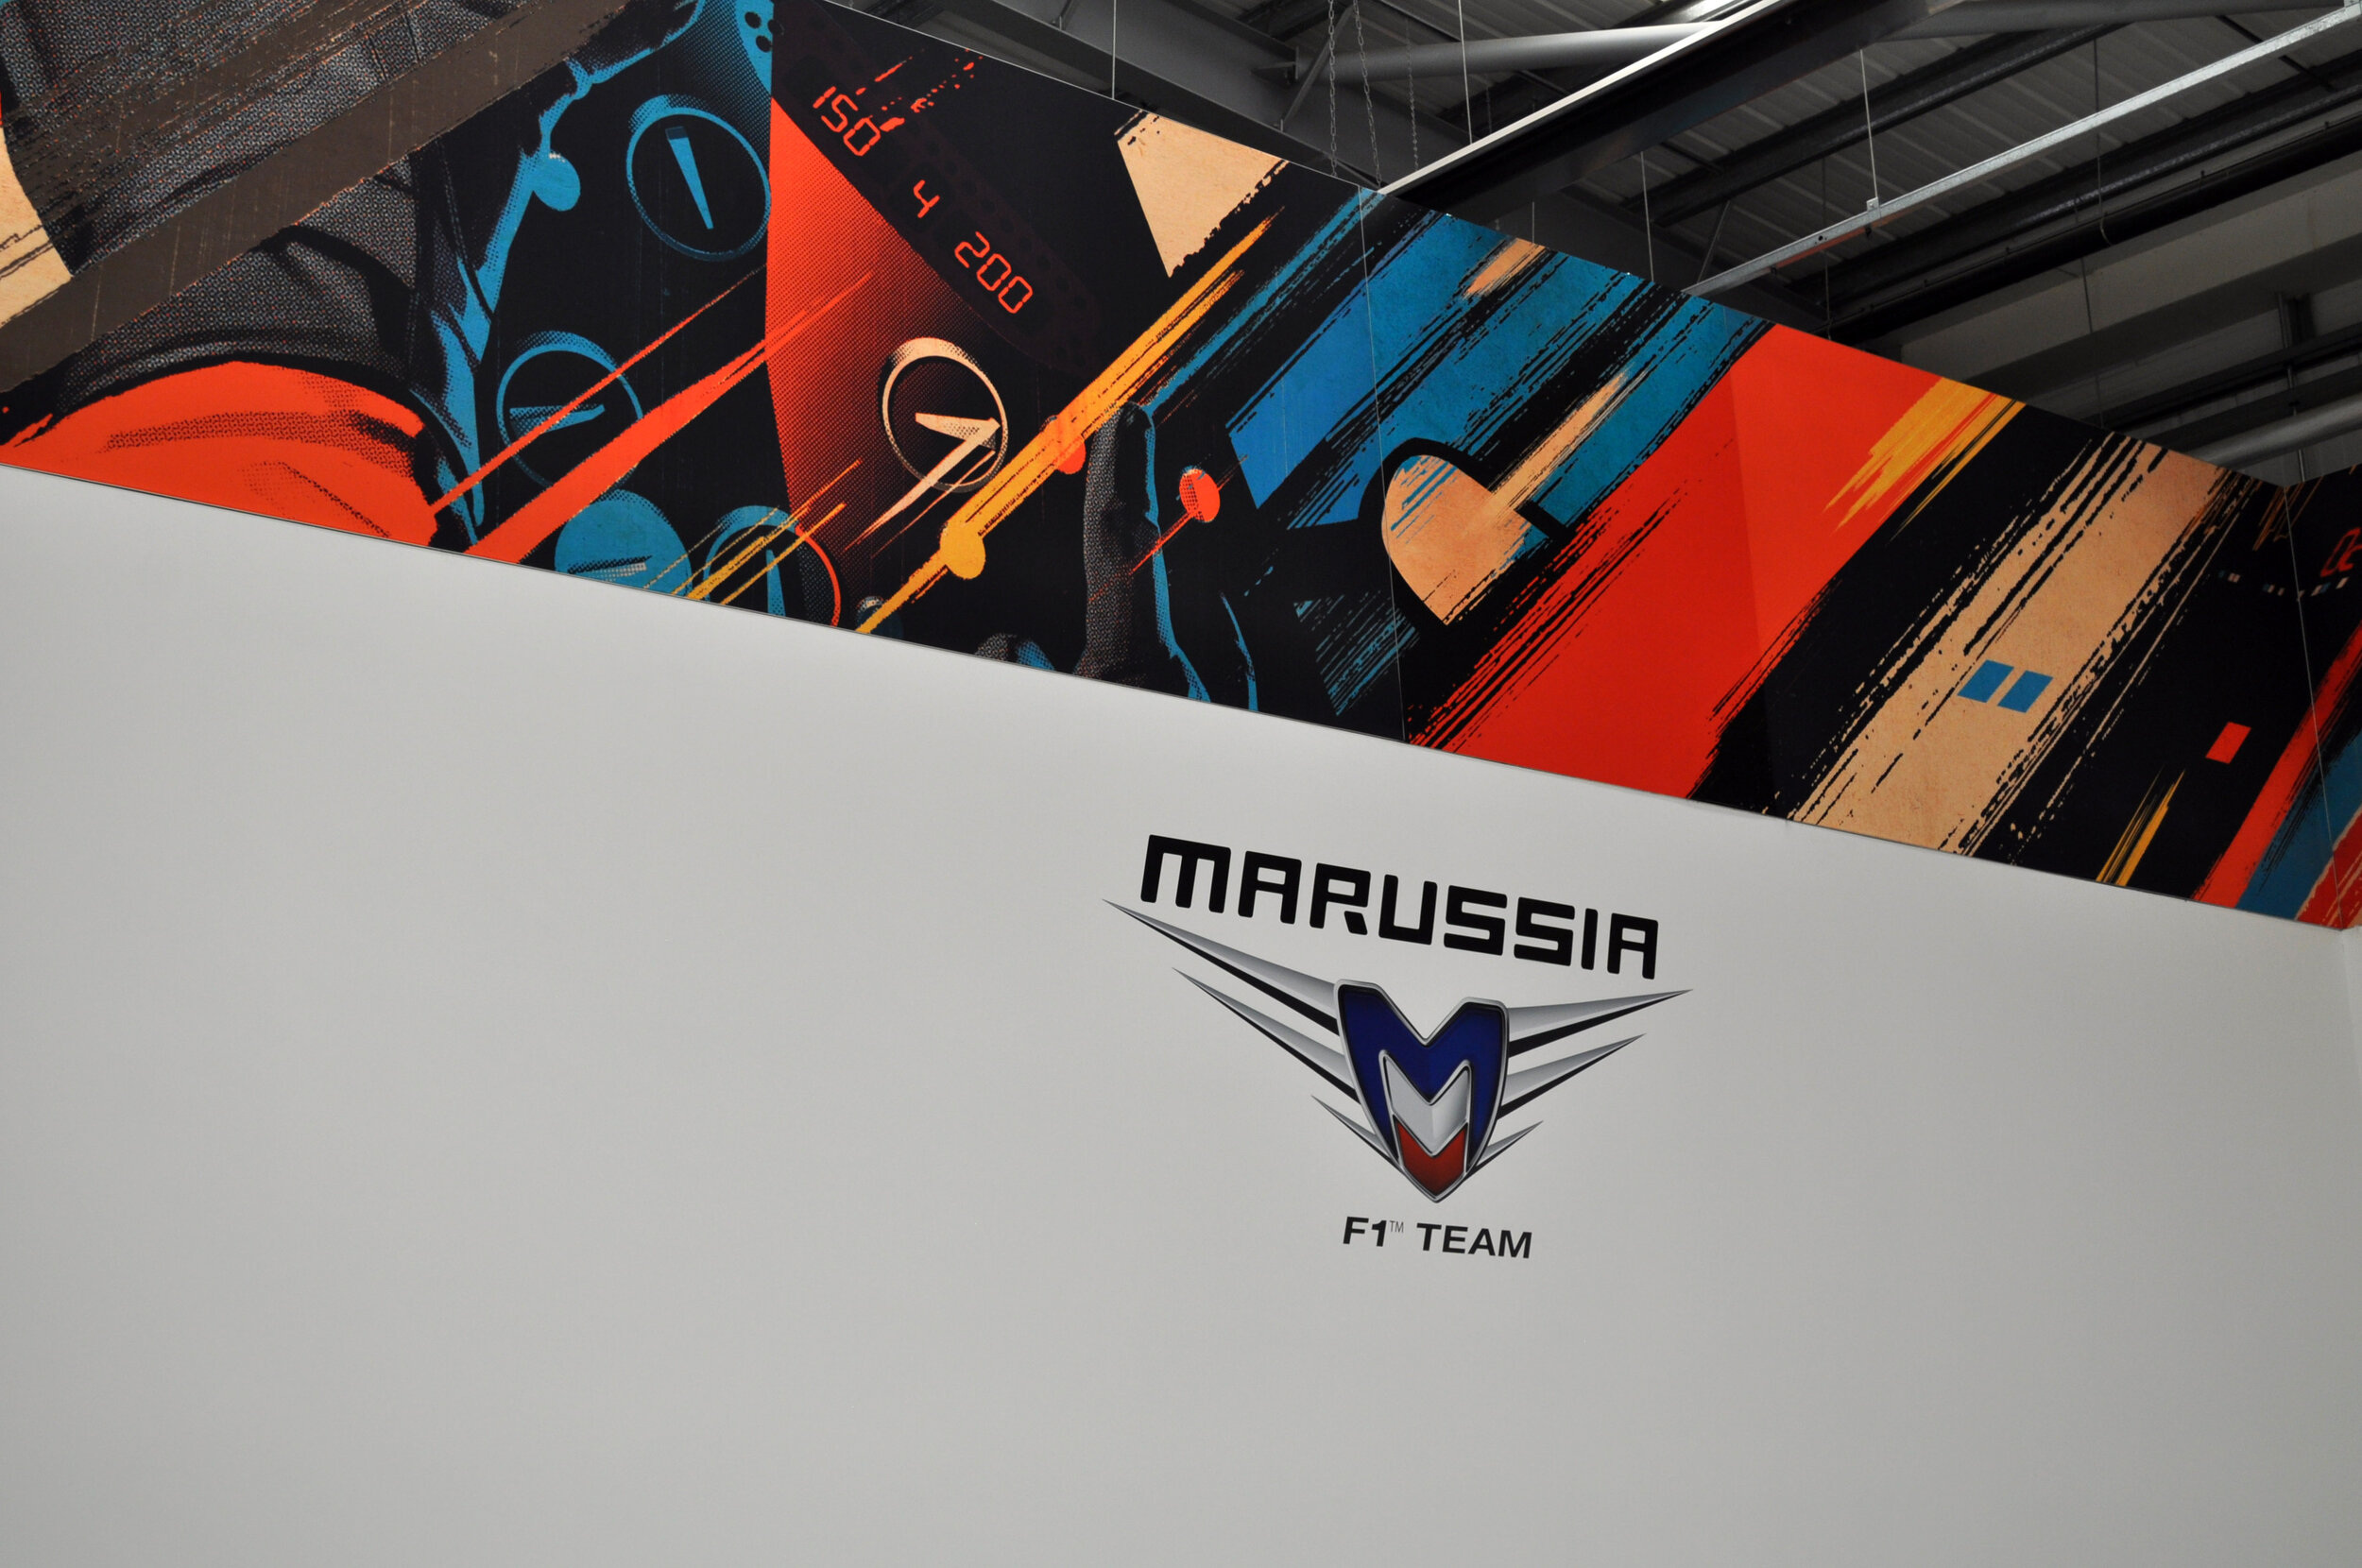 tavis-coburn-F1-team-graphic-illustration-marussia-36.JPG